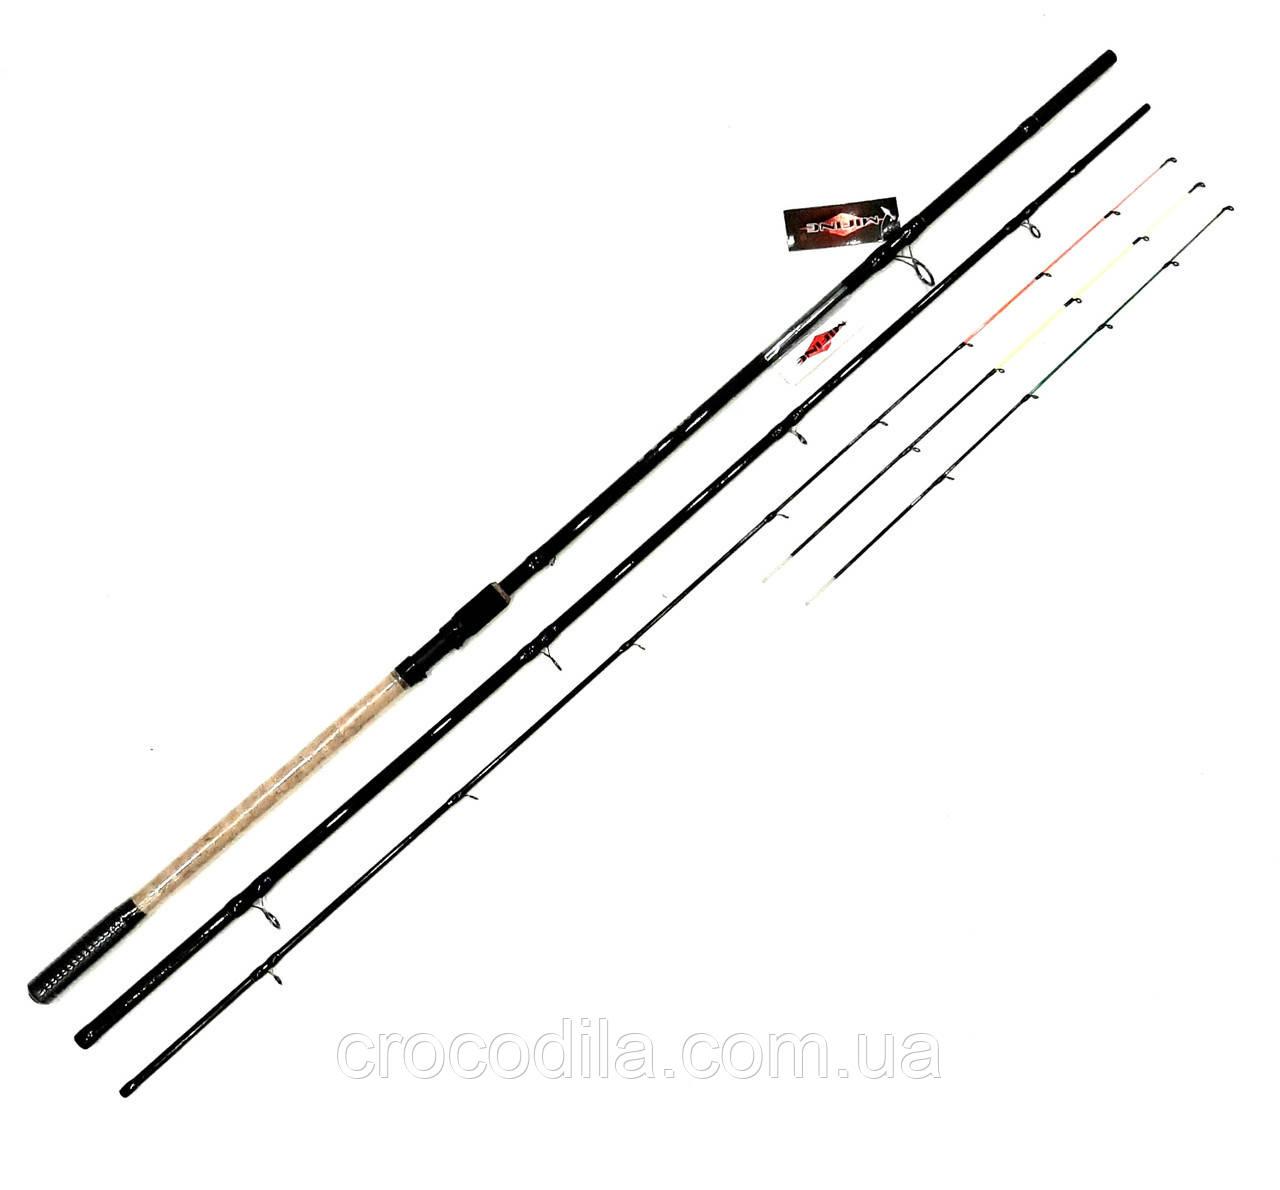 Фидерное удилище Mifine Strong Hammer 3.9 м 80/140/200 грамм